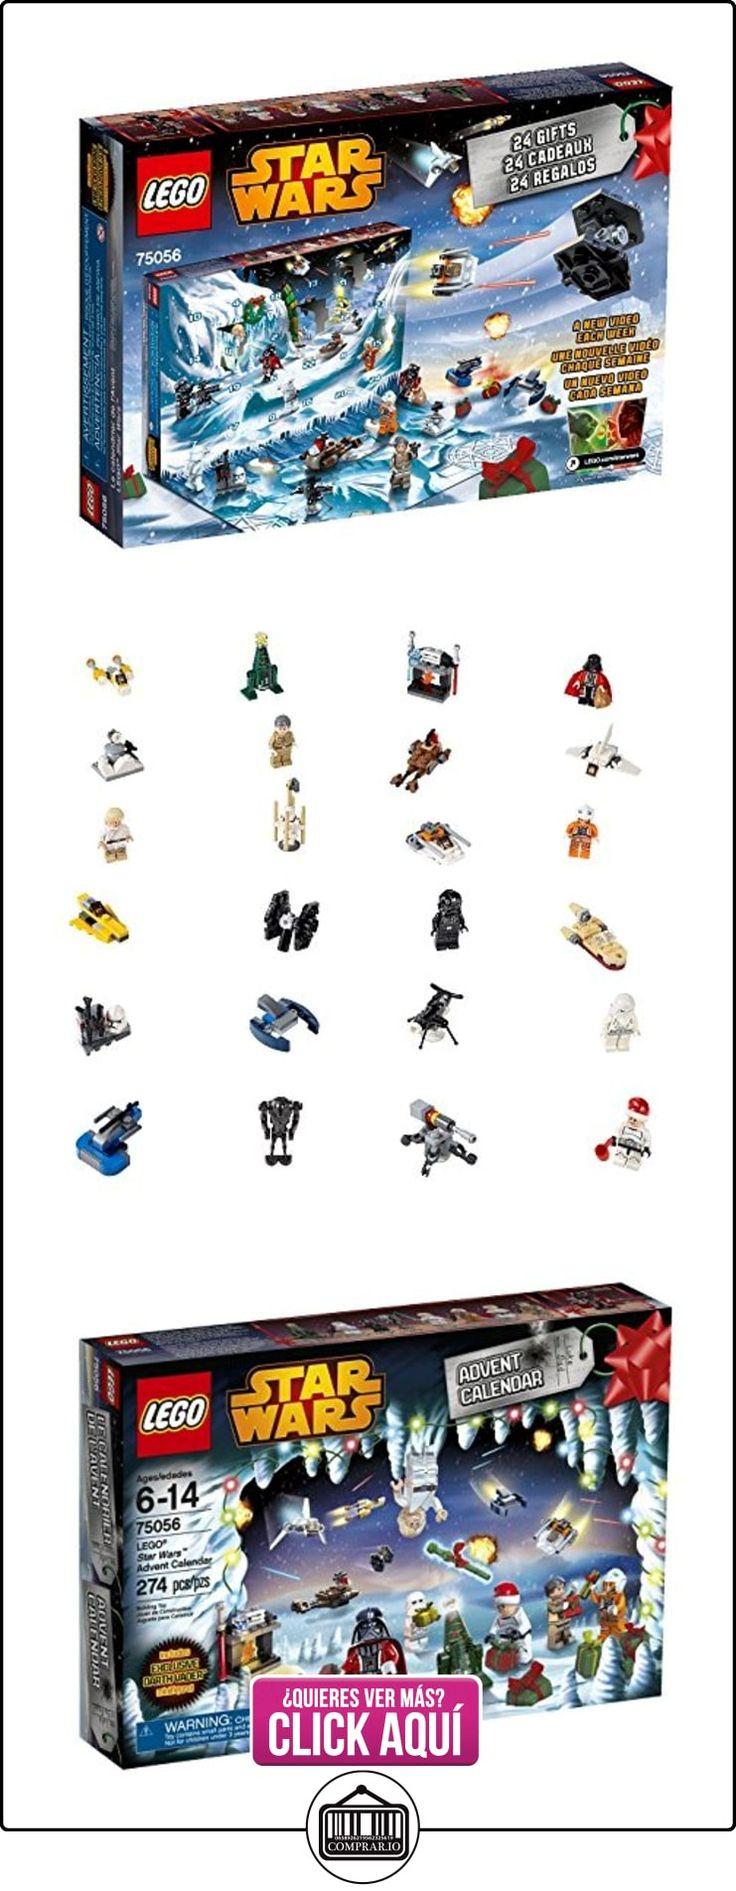 LEGO Star Wars Advent Calendar 75056(Discontinued by manufacturer) by LEGO  ✿ Lego - el surtido más amplio ✿ ▬► Ver oferta: https://comprar.io/goto/B00J4S98AW